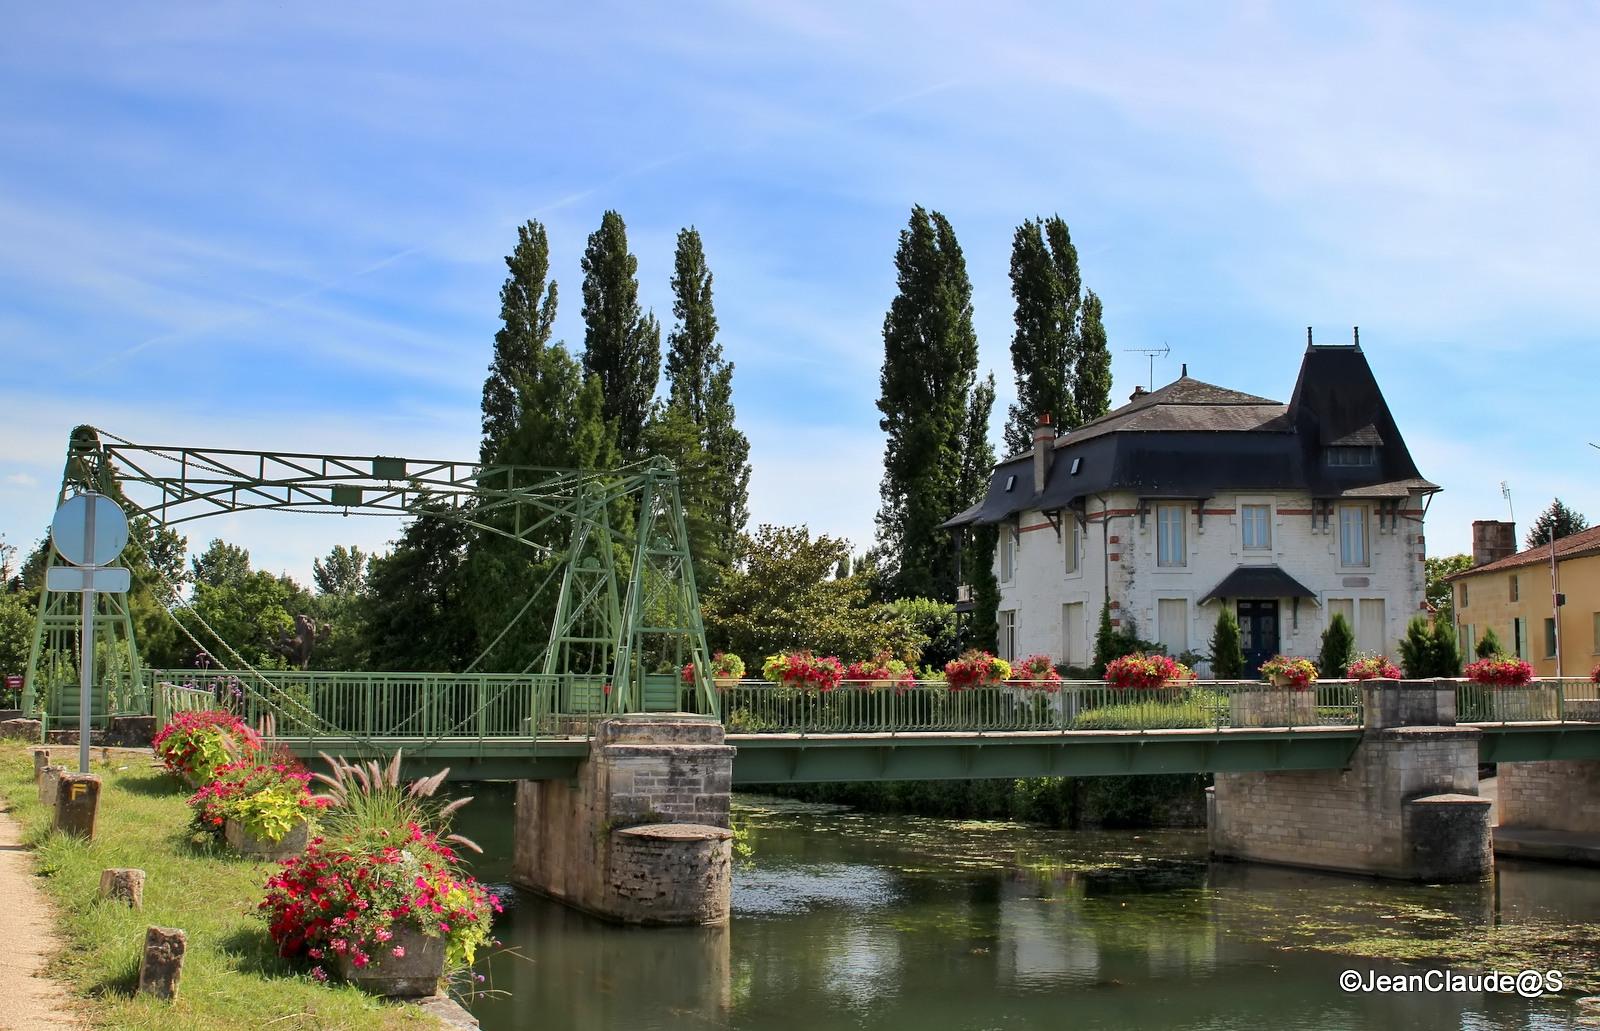 Le Marais Poitevin Img_0548_filtered-529c480